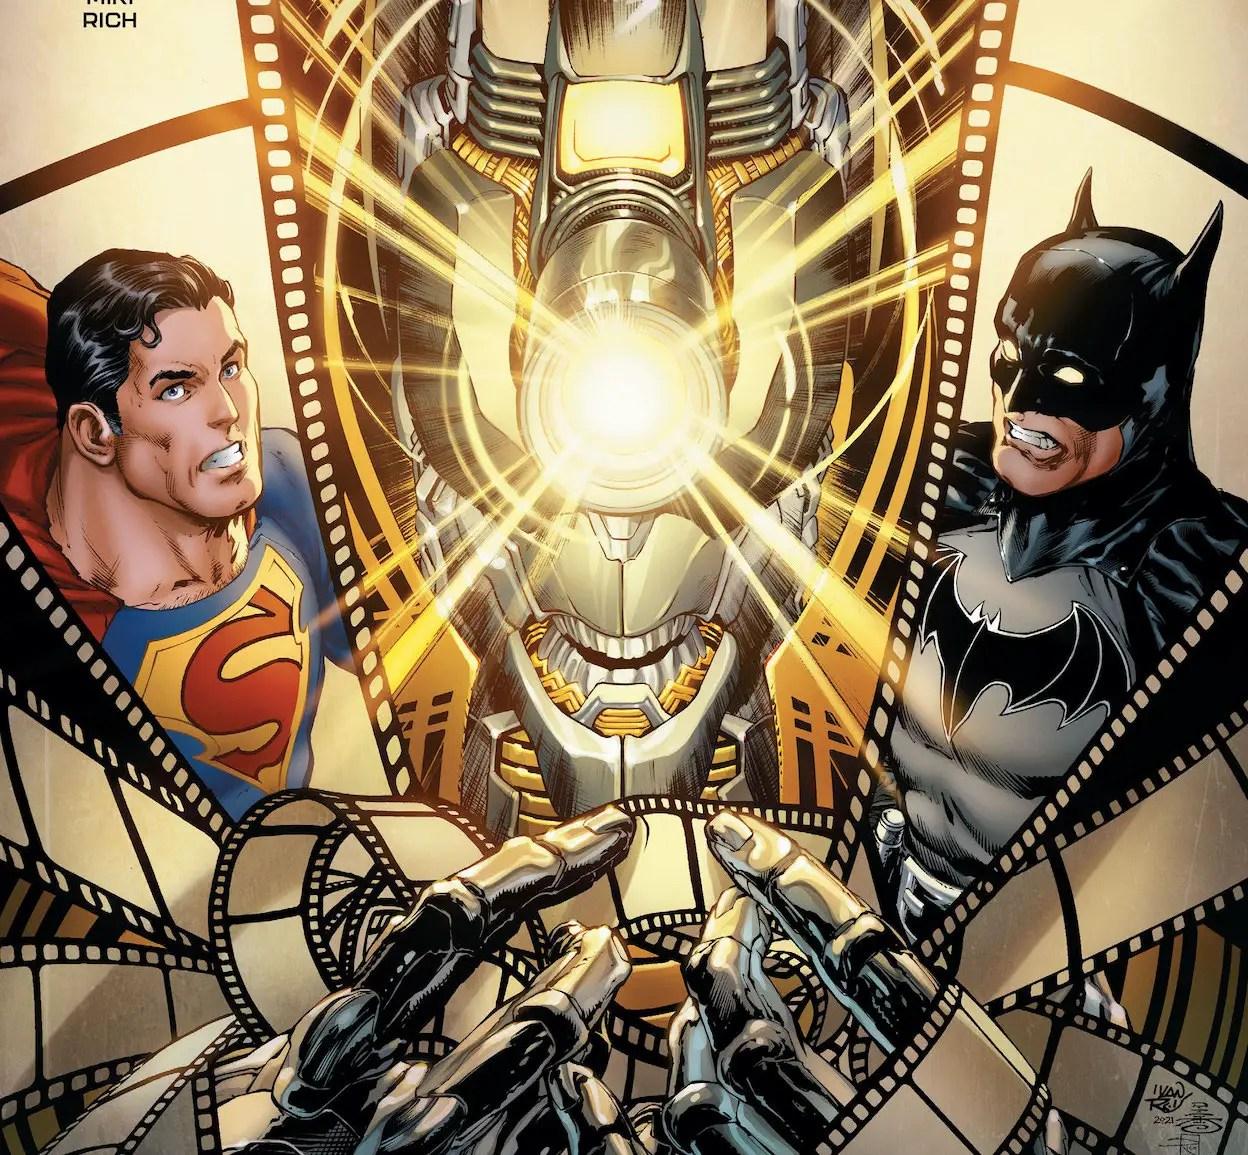 'Batman/Superman' #18 is good Elseworlds storytelling